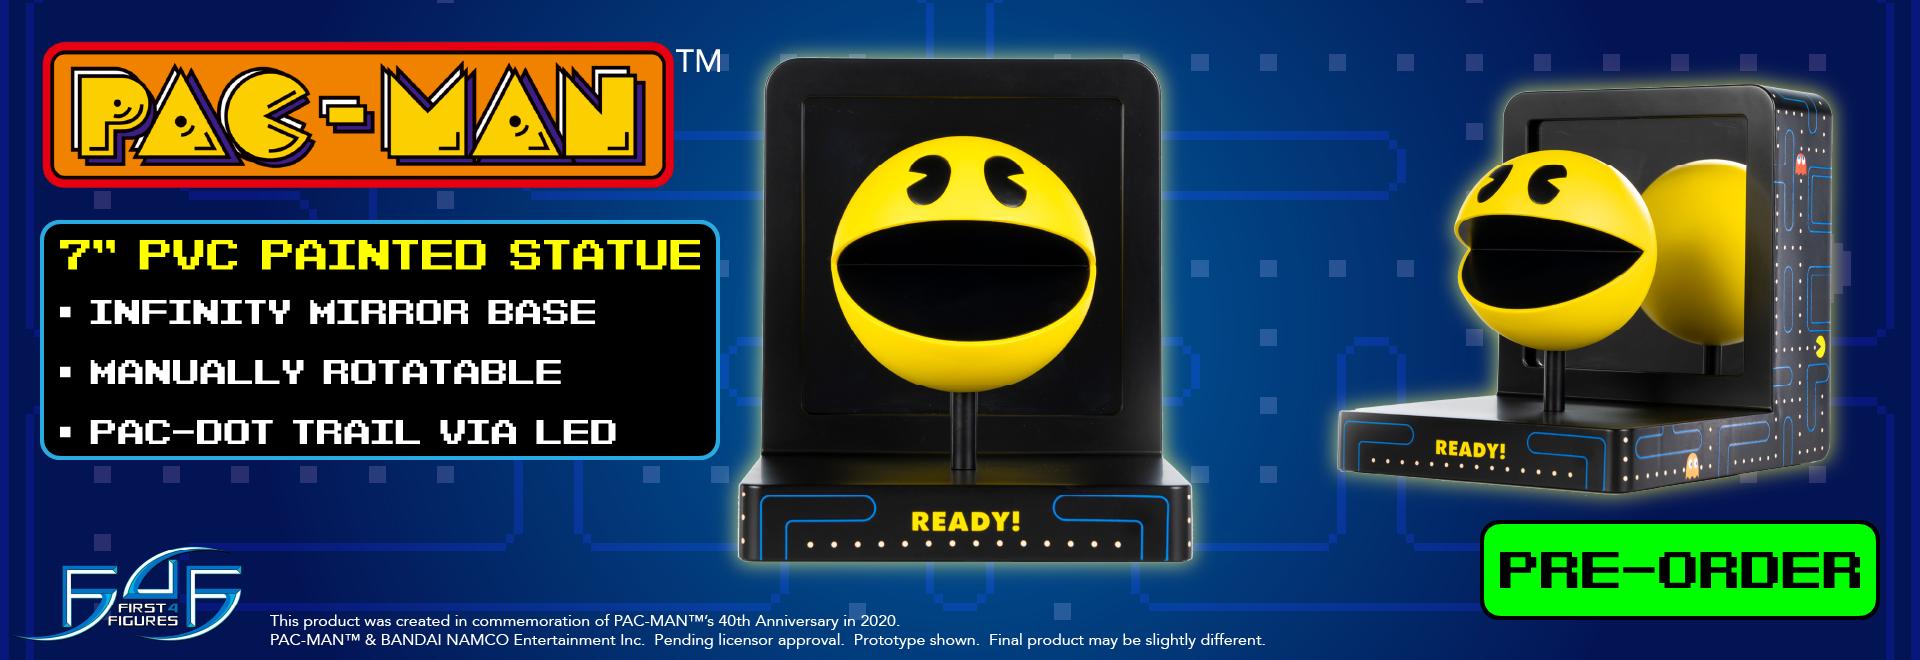 Pac-Man PVC Stature Pre-orders